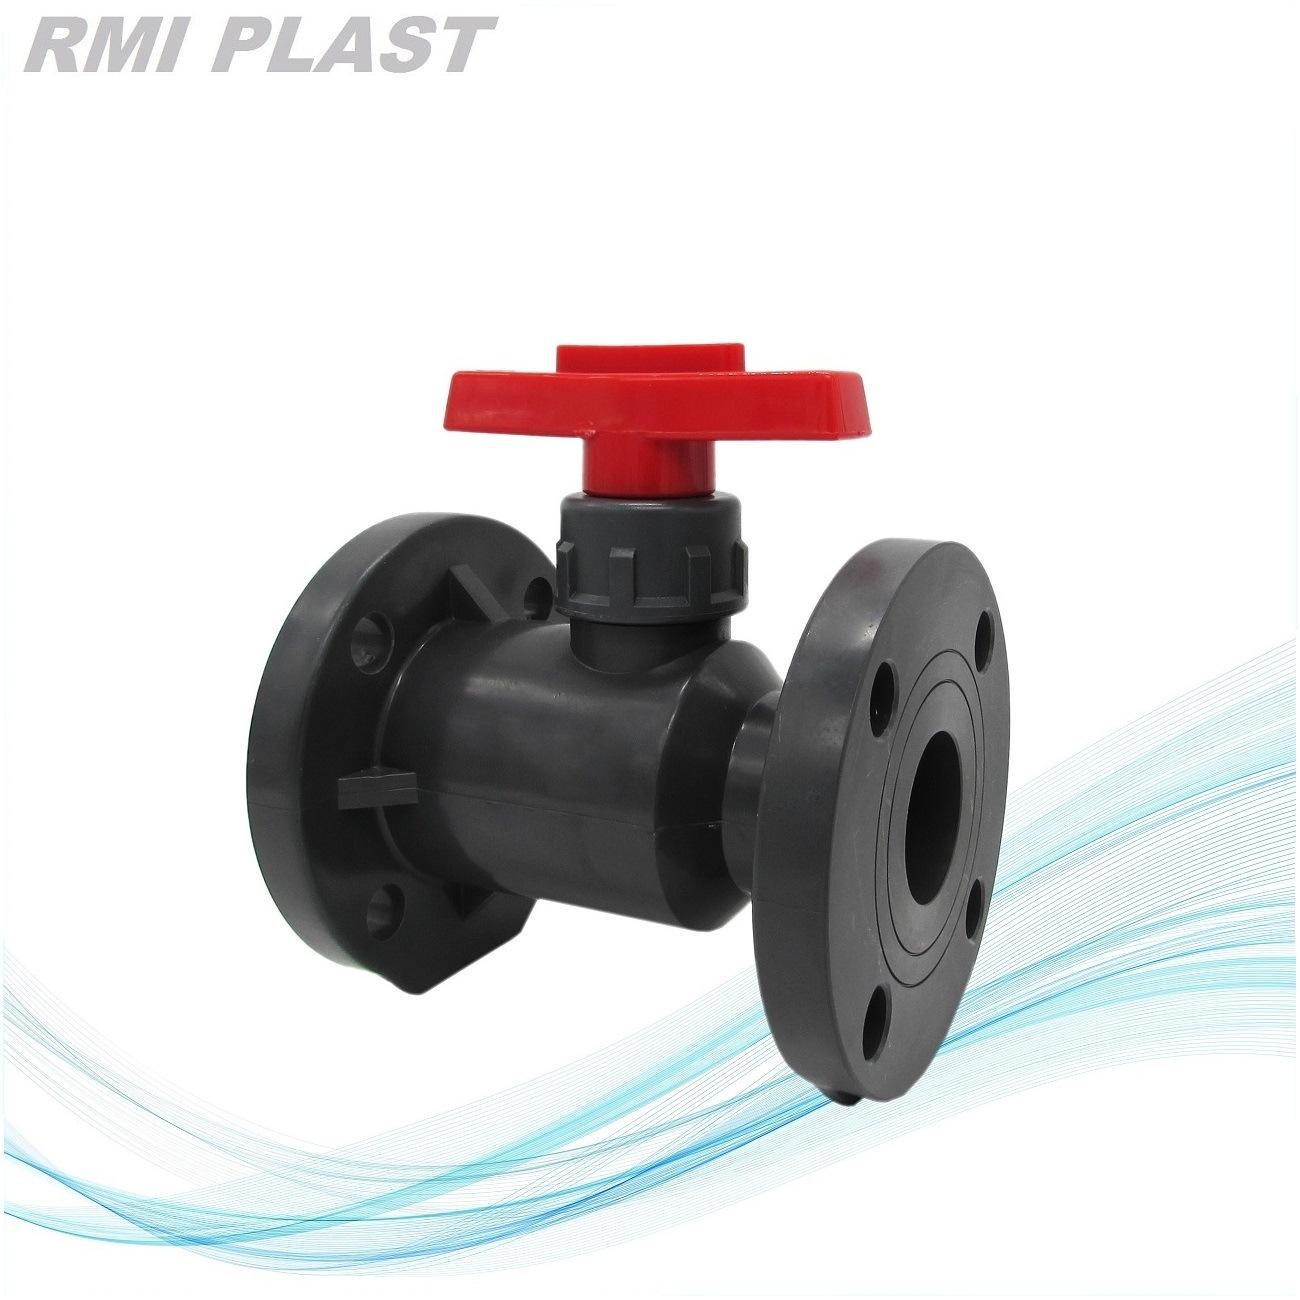 PVDF PP CPVC PVC Plastic Ball Valve